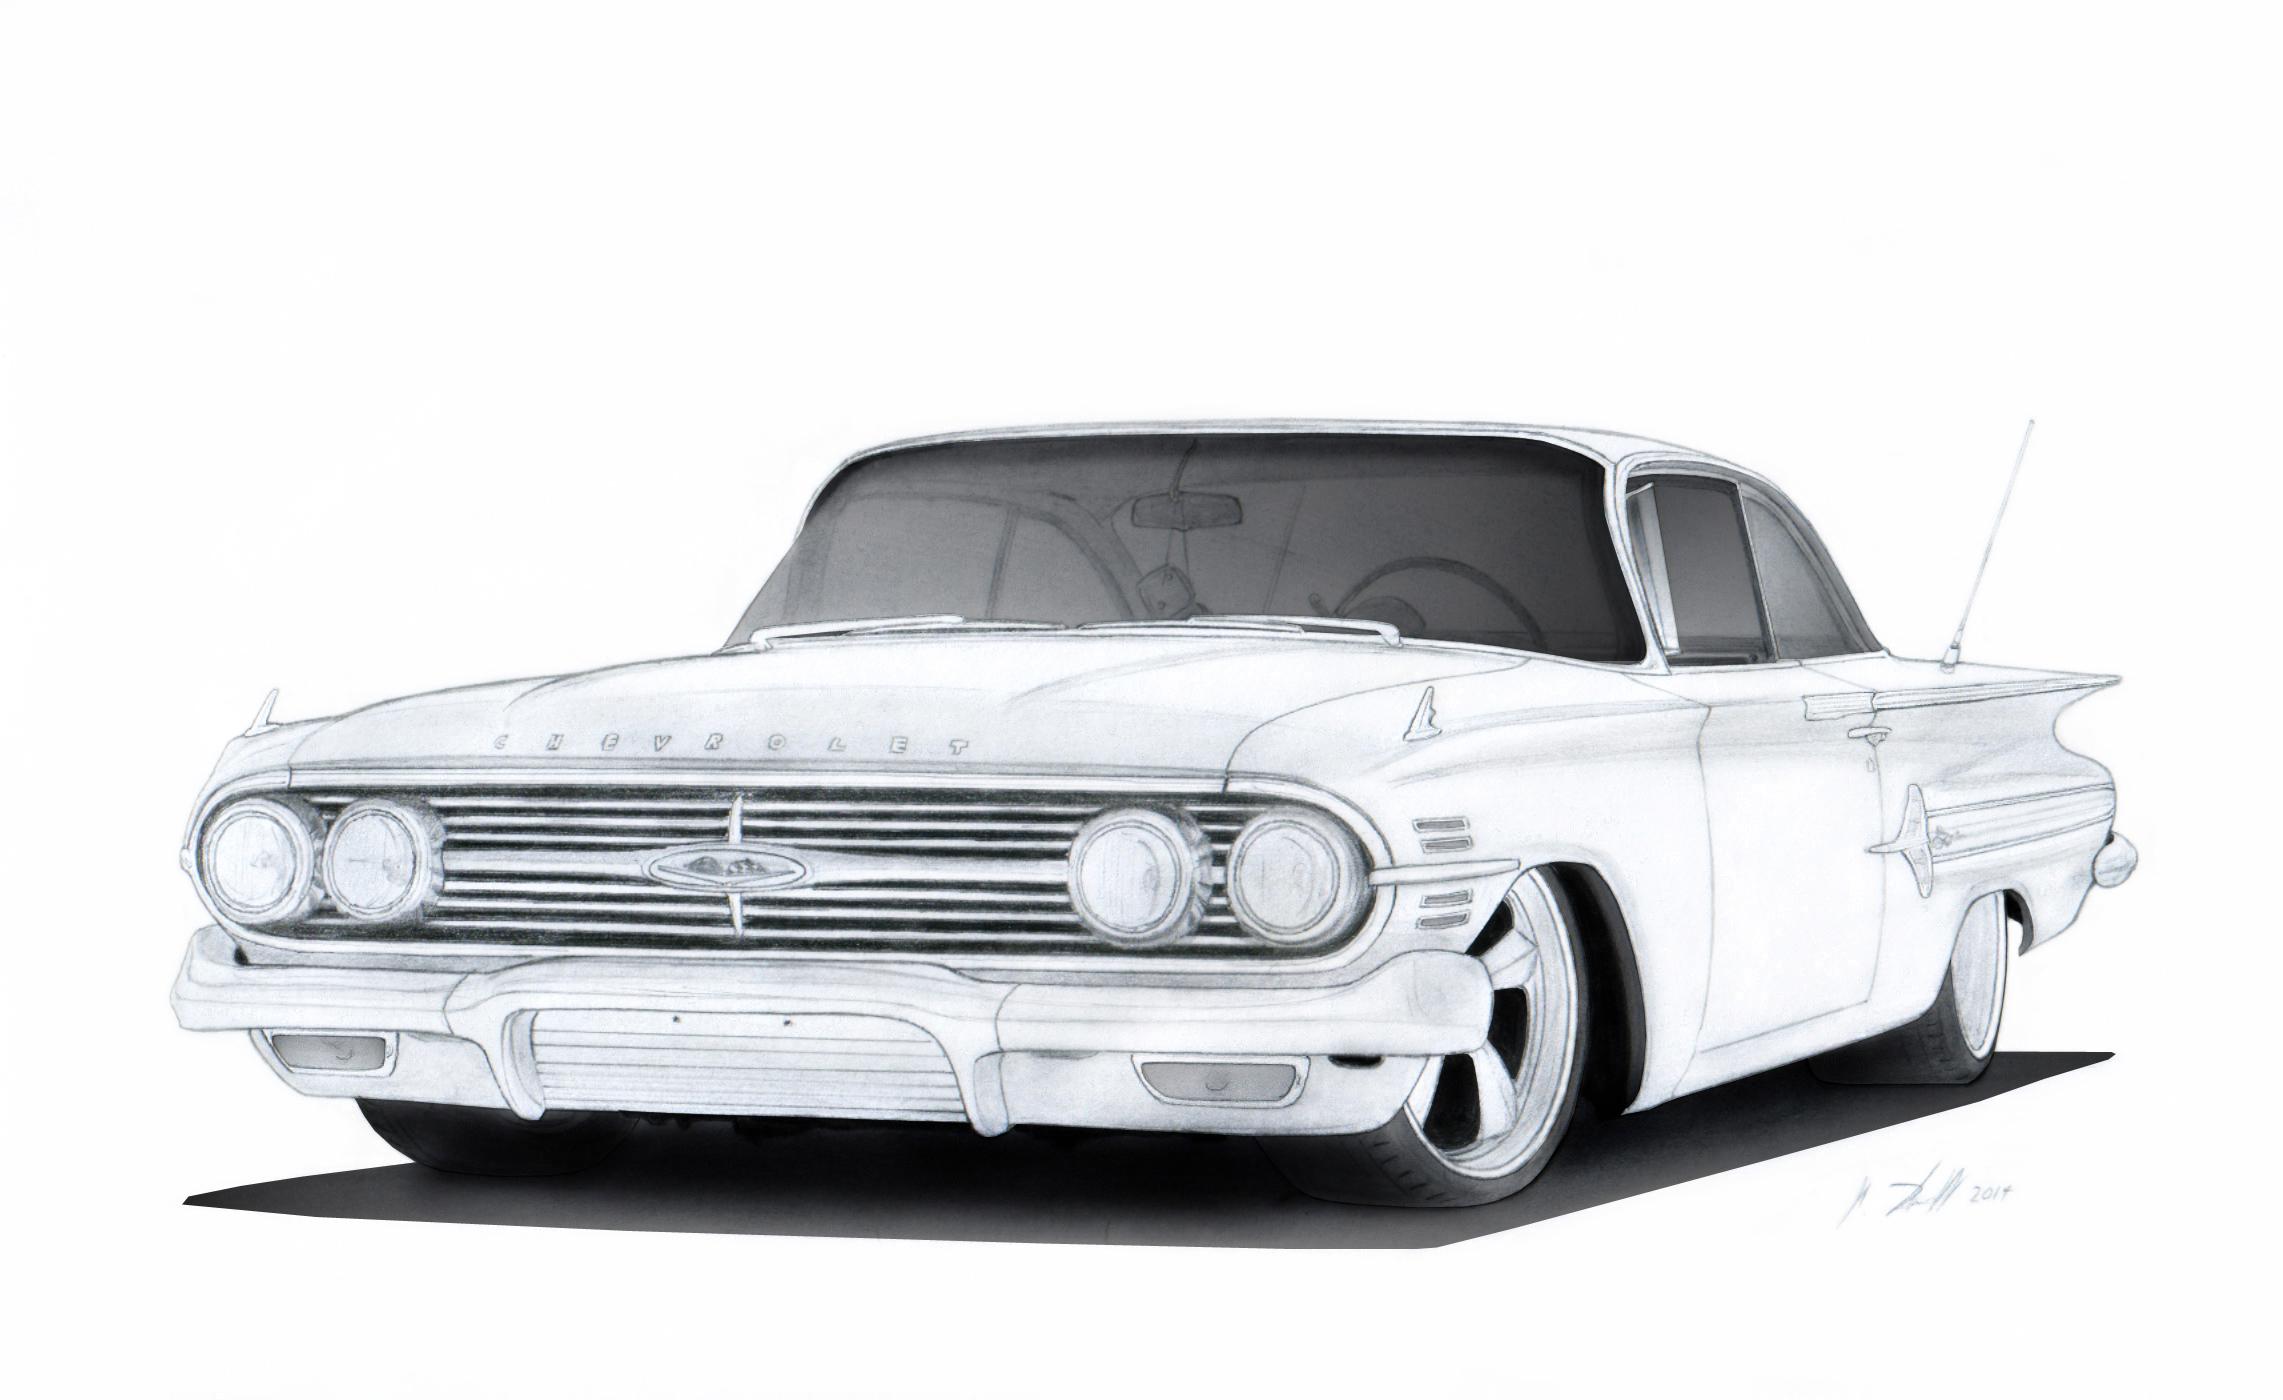 Lowrider Impala Drawings 64 Impala Drawing ChevyLowrider Chevy Truck Drawings